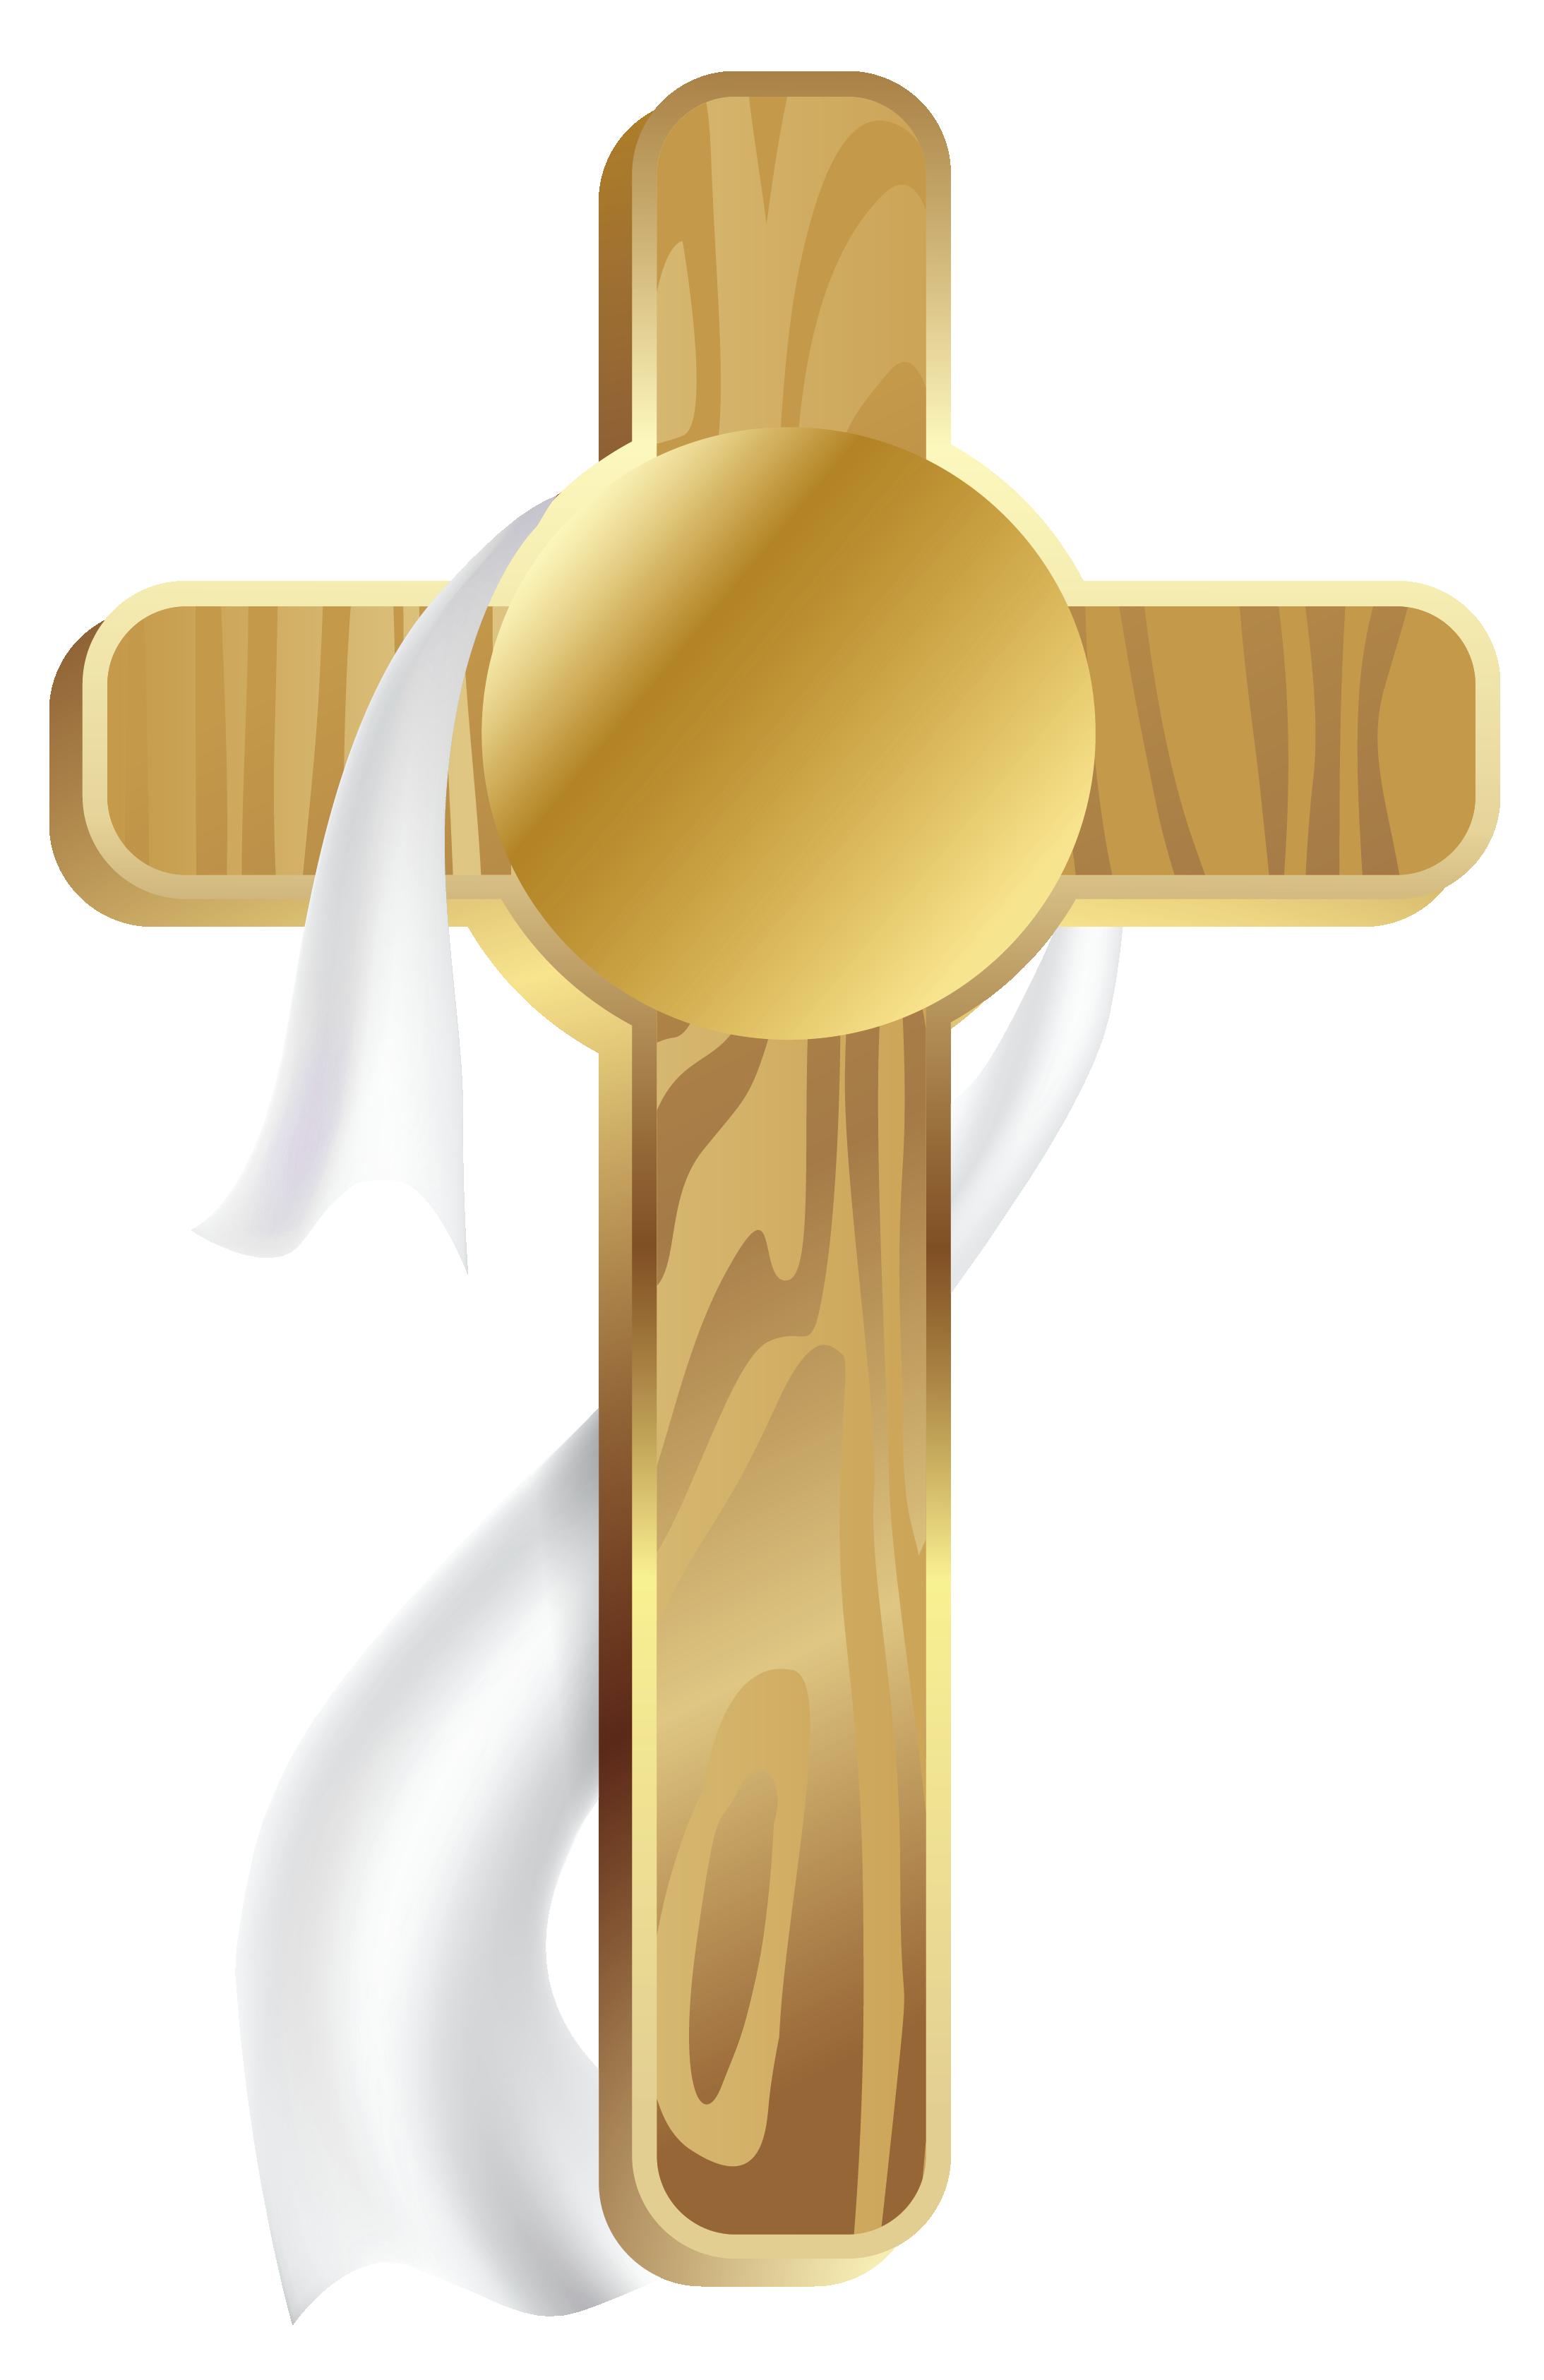 Wooden Cross Png Picture Clipart Wooden Cross Clip Art Wooden Crosses